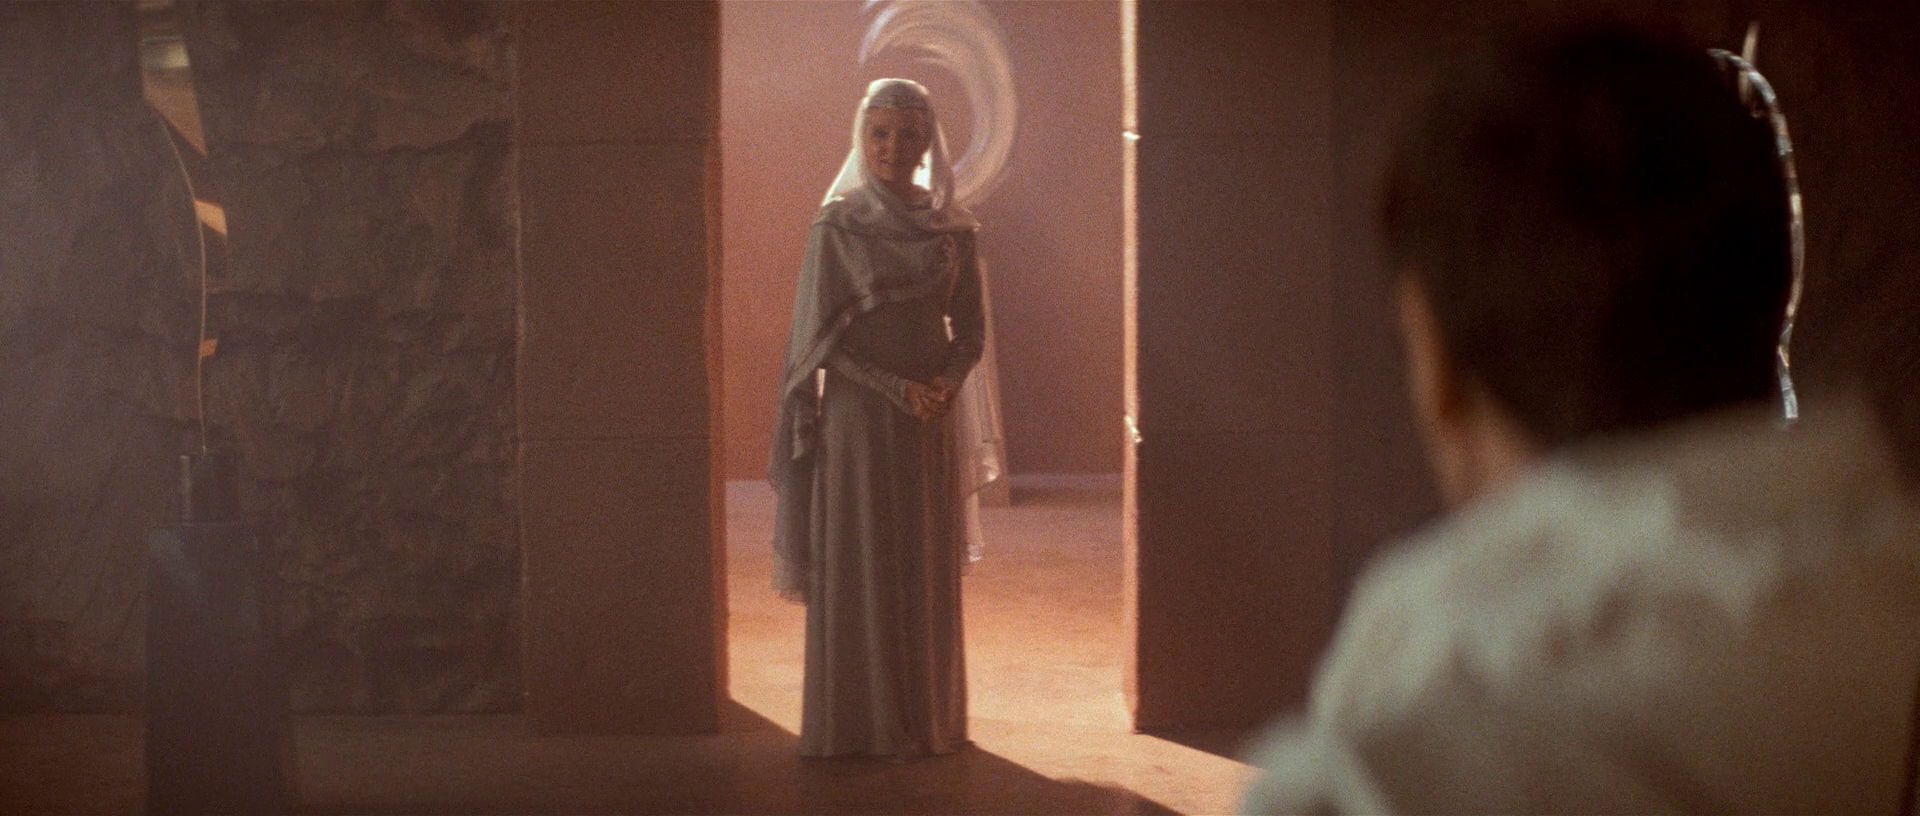 悠悠MP4_MP4电影下载_星际旅行4:抢救未来 Star.Trek.IV.The.Voyage.Home.1986.REMASTERED.1080p.BluRay.x264.DTS-FG